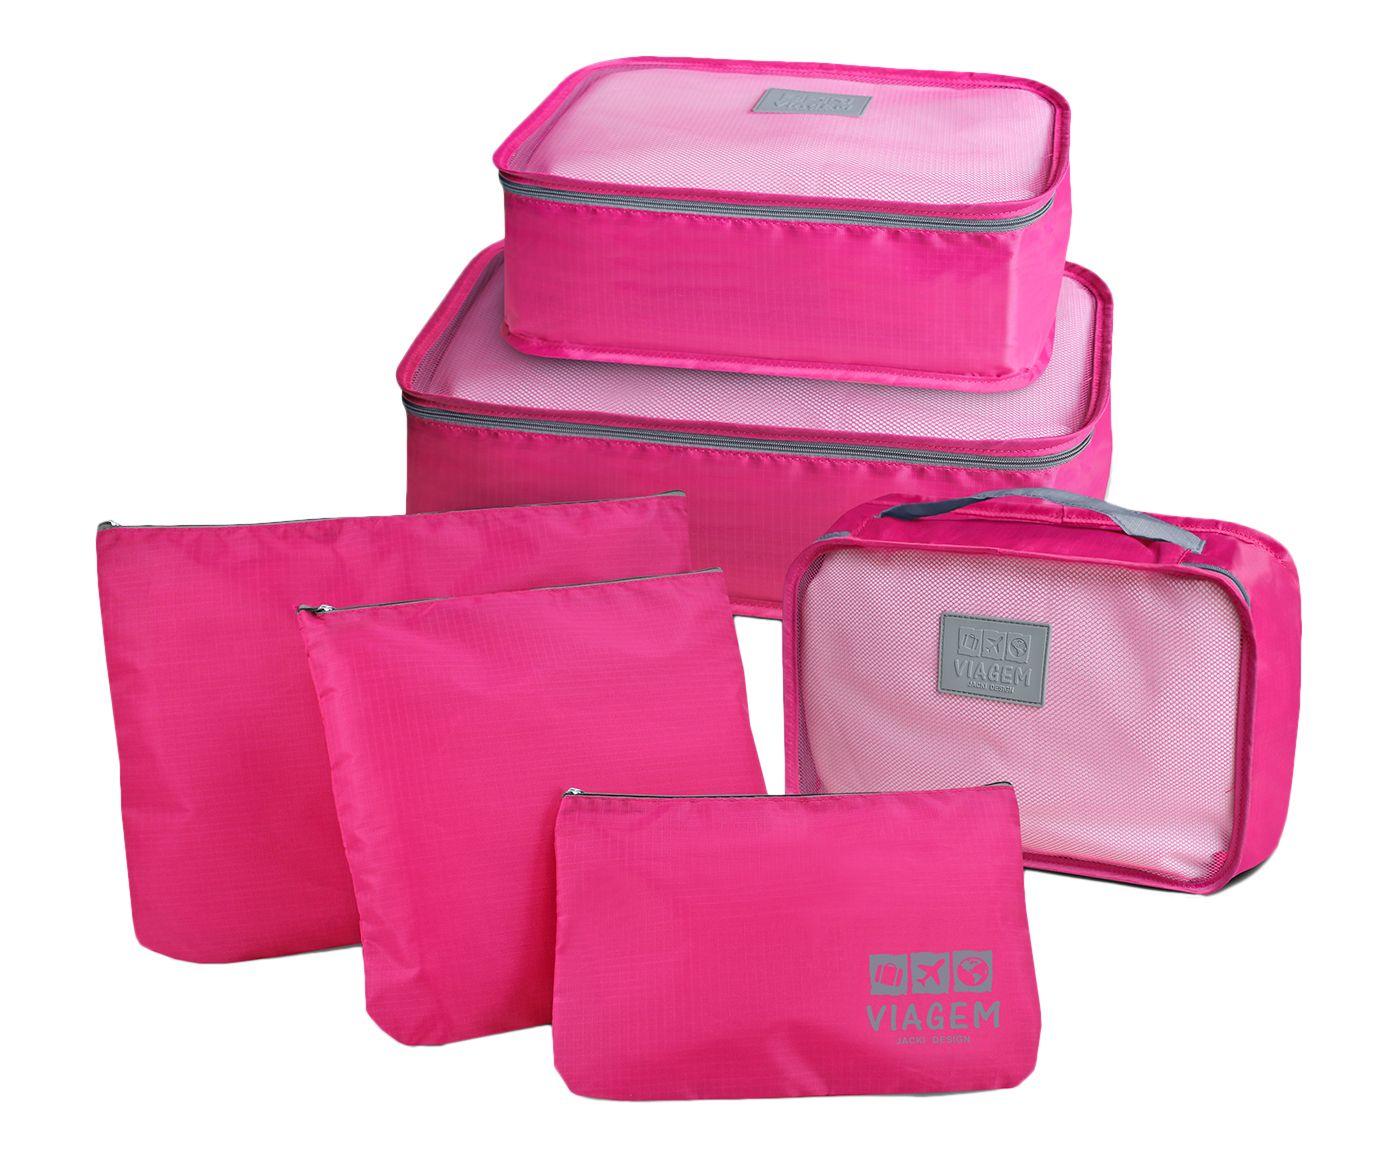 Jogo de Organizadores de Mala Elba - Pink | Westwing.com.br